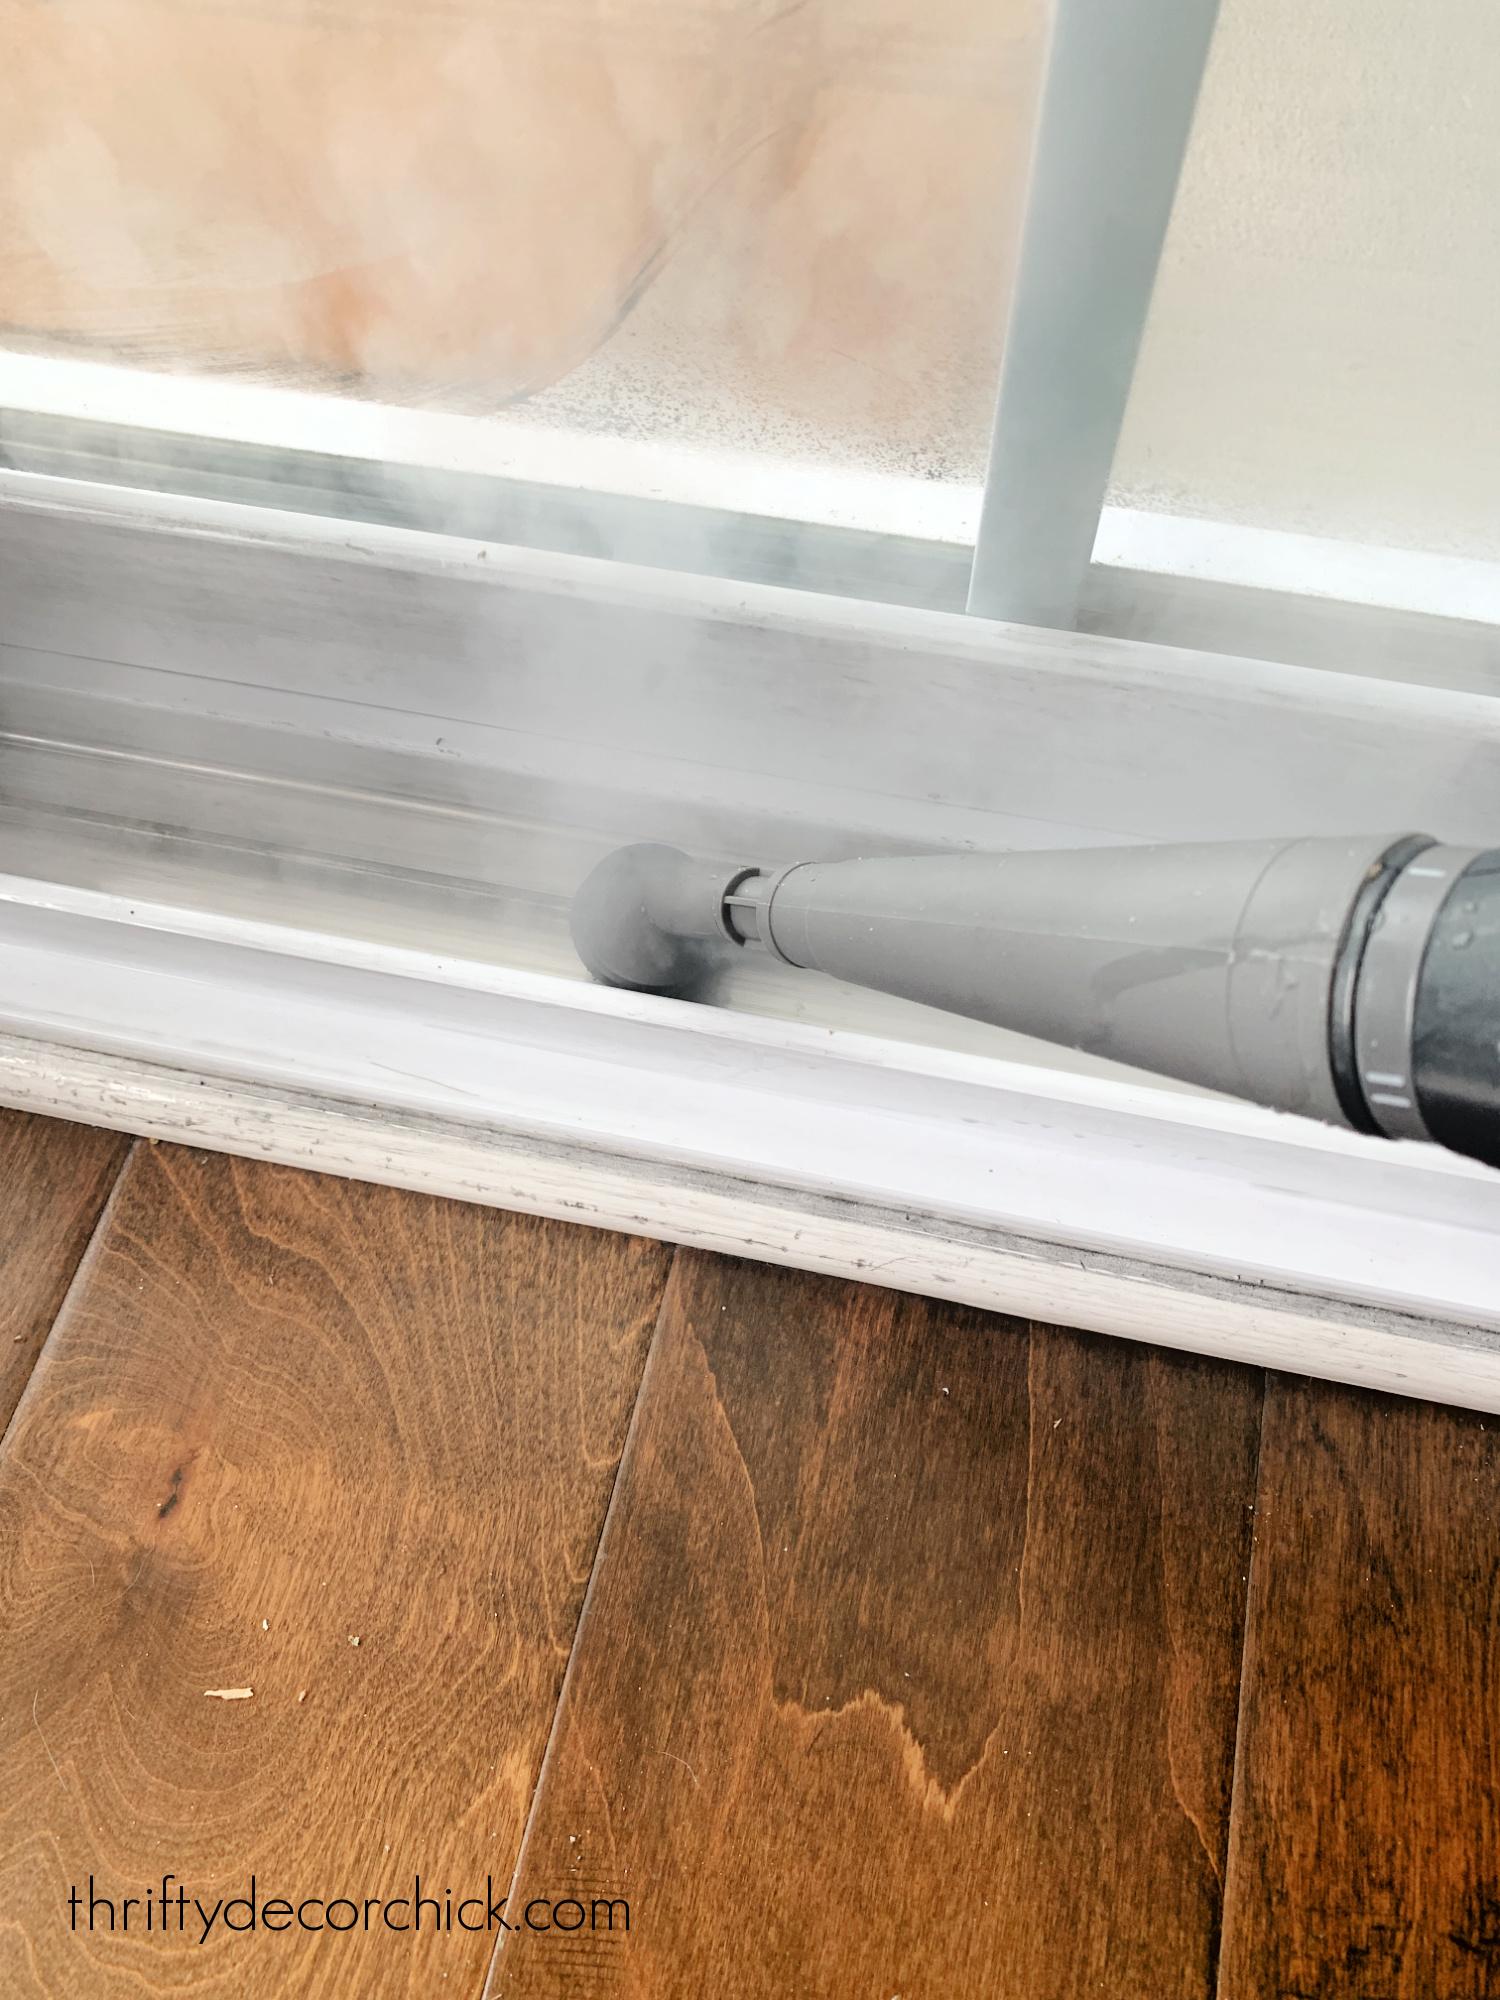 steamer to clean door and window tracks